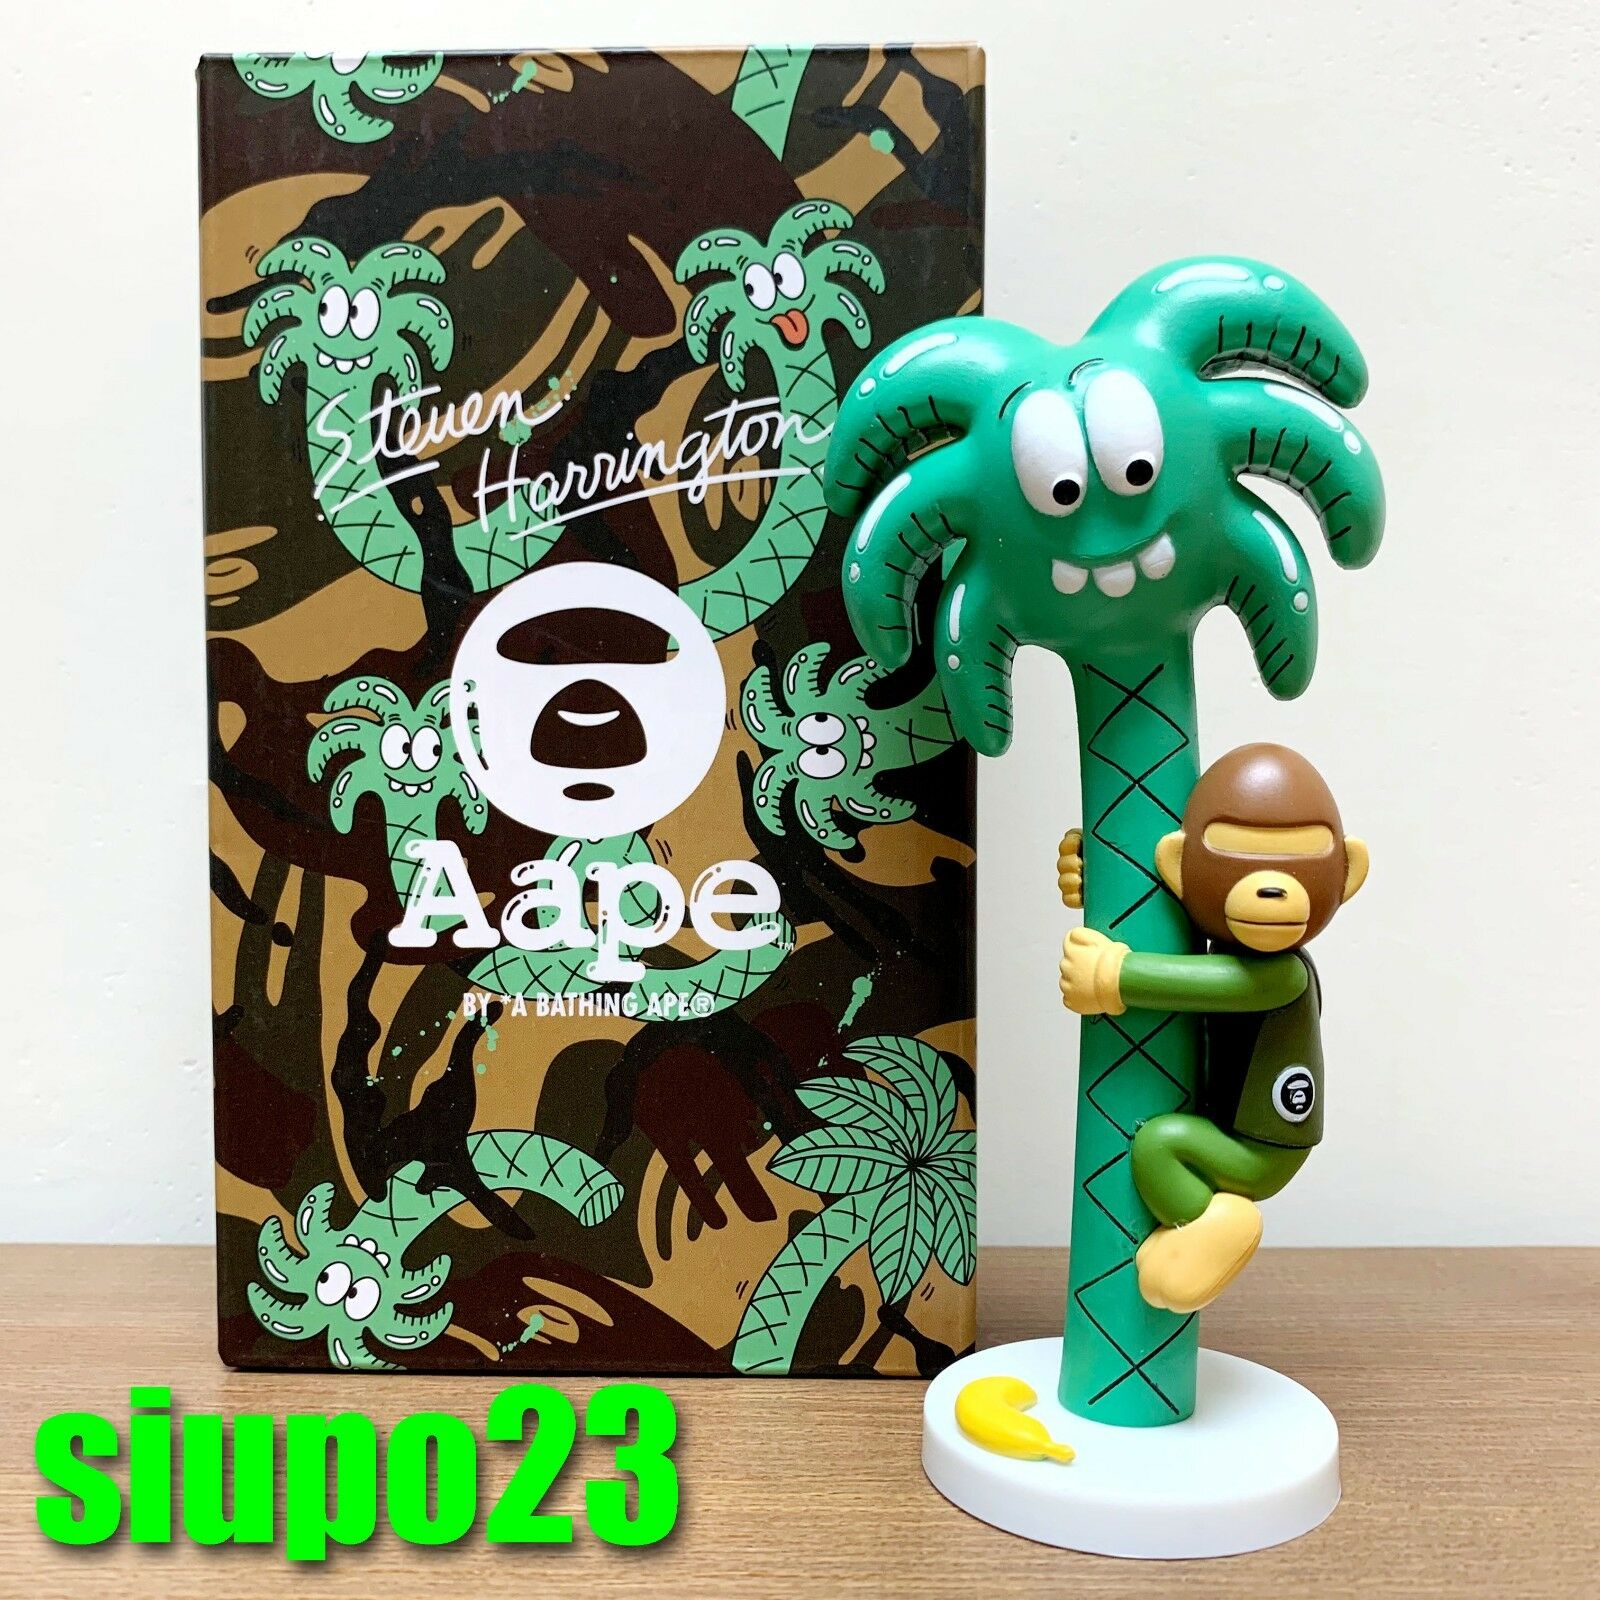 A Bathing  Ape Aape x Steven Harrington 12  Sculpture, Ltd 300pcs  prodotti creativi